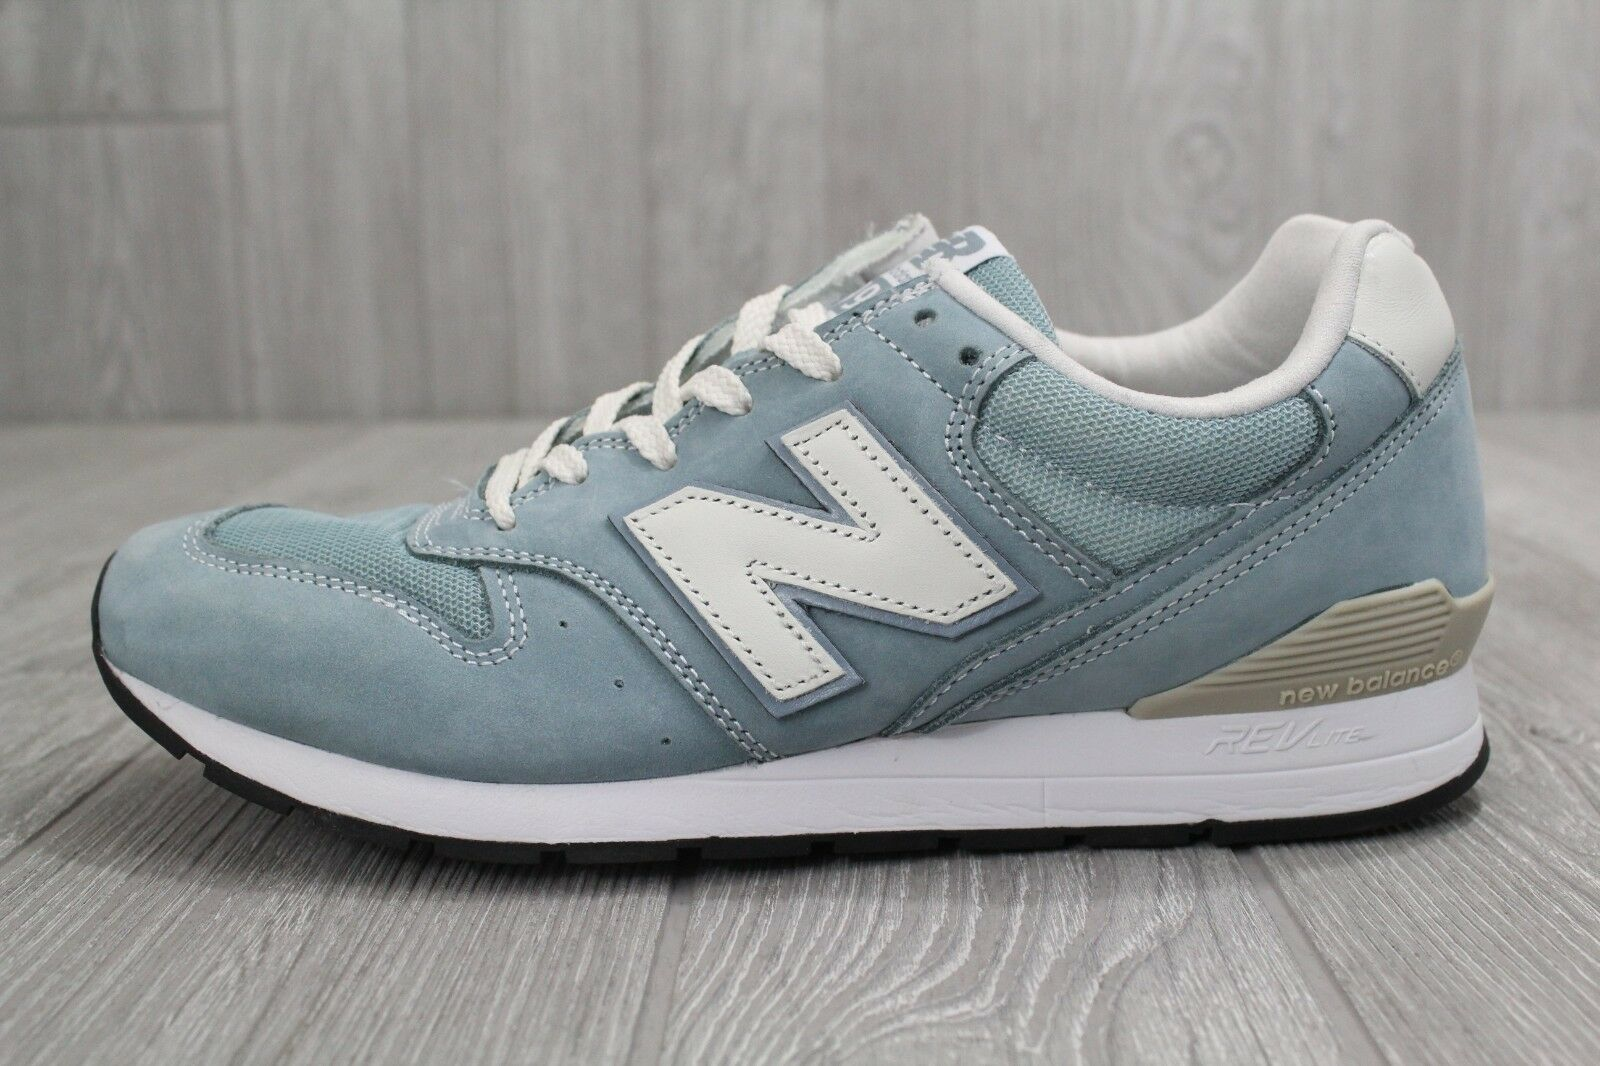 27 Men's New Balance 996 FL Size 8.5 MRL996FL Light Blue Citadel Revlite Shoes